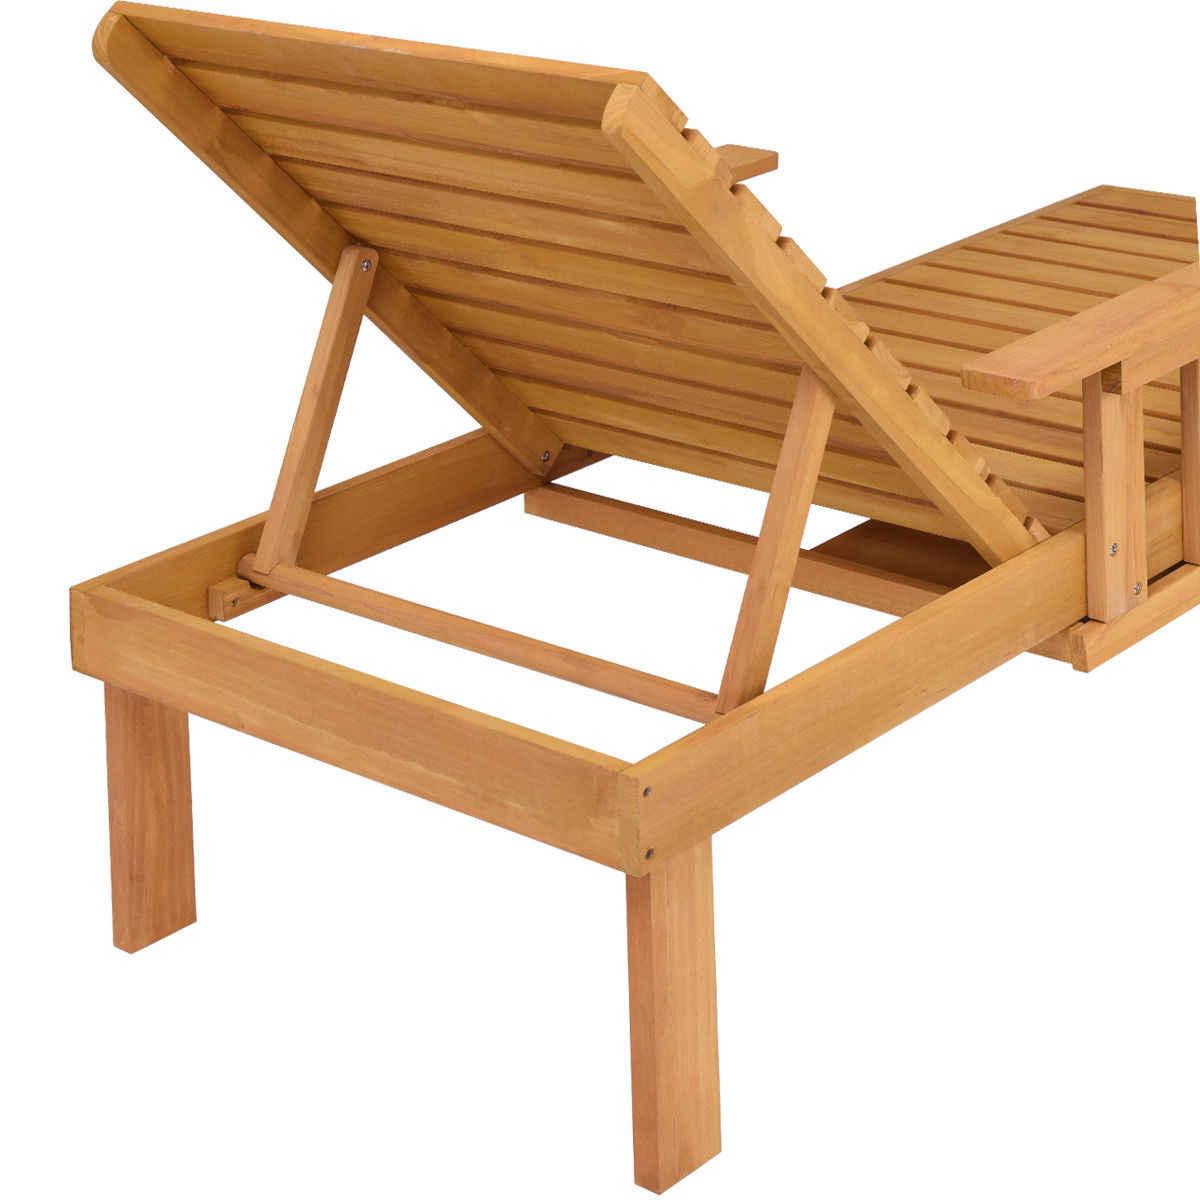 c3160376a10 ... Giantex Patio Chaise Sun Lounger Outdoor Furniture Garden Side Tray  Deck Chair Modern Wood Beach Lounge